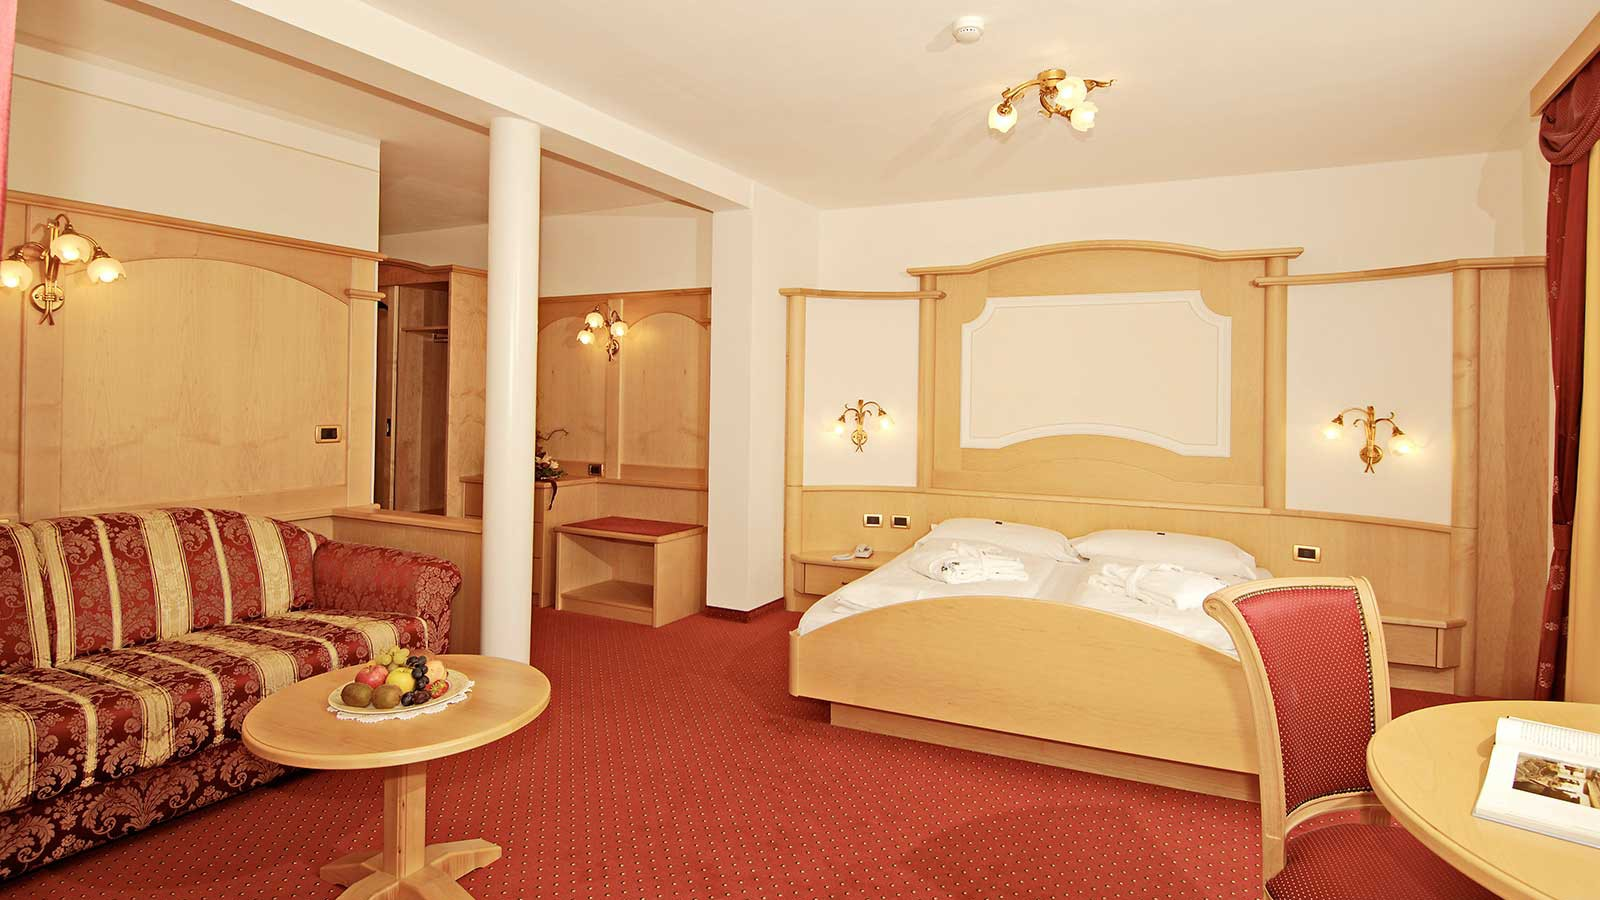 Alpenheim Charming Hotel - Superior room 2